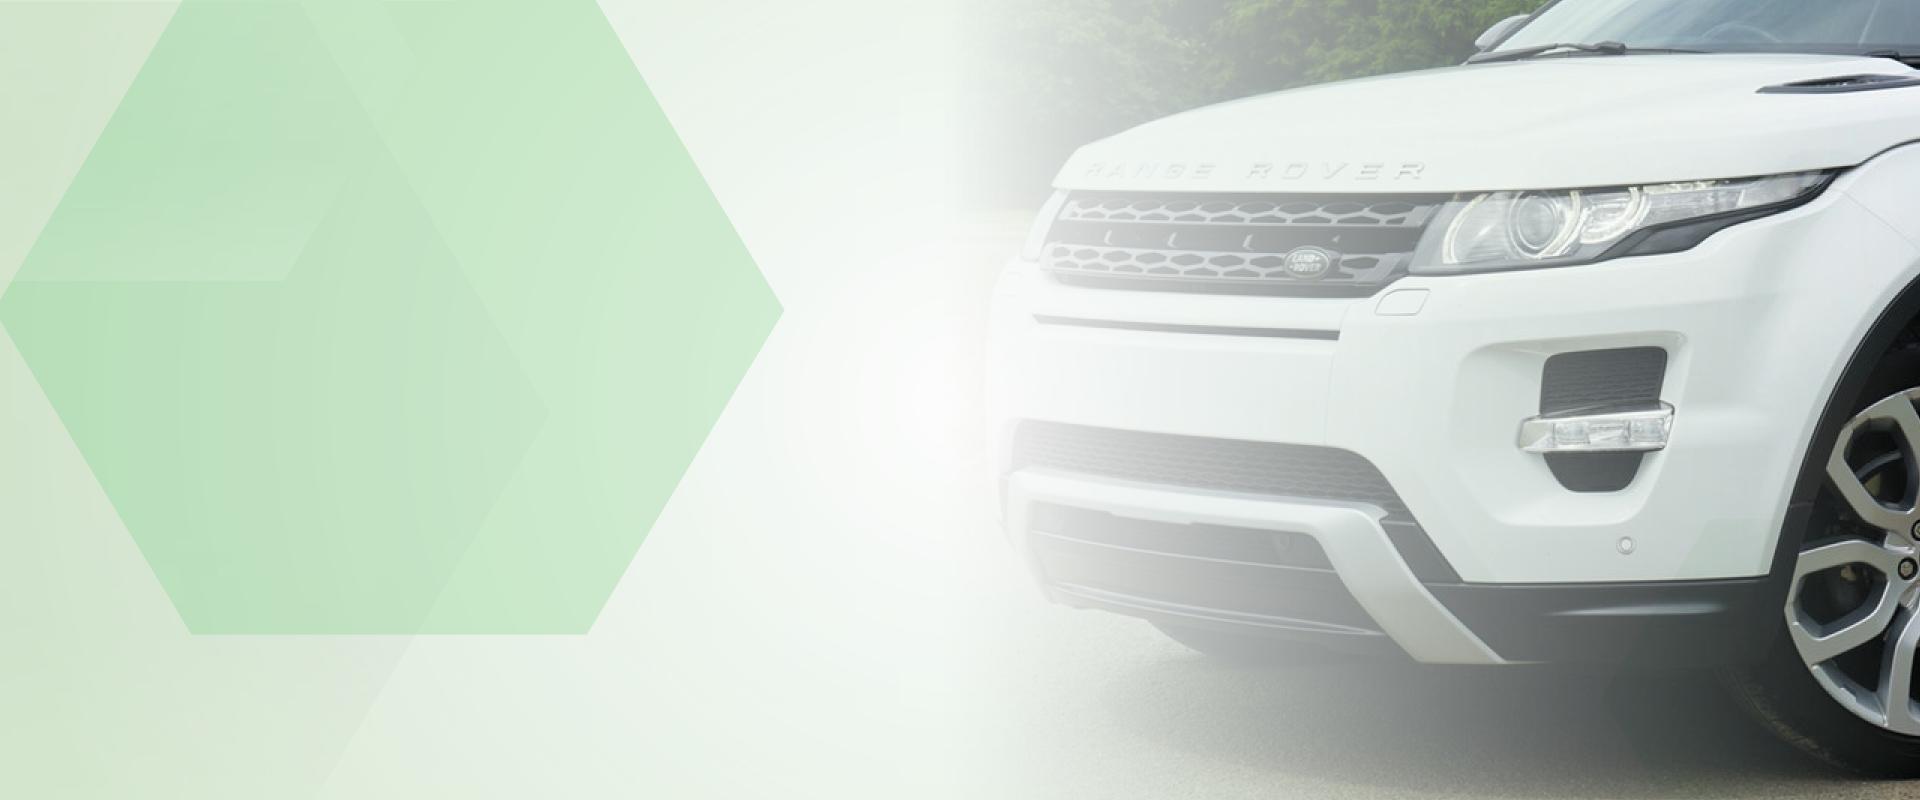 Prestige-Car-Finance-1